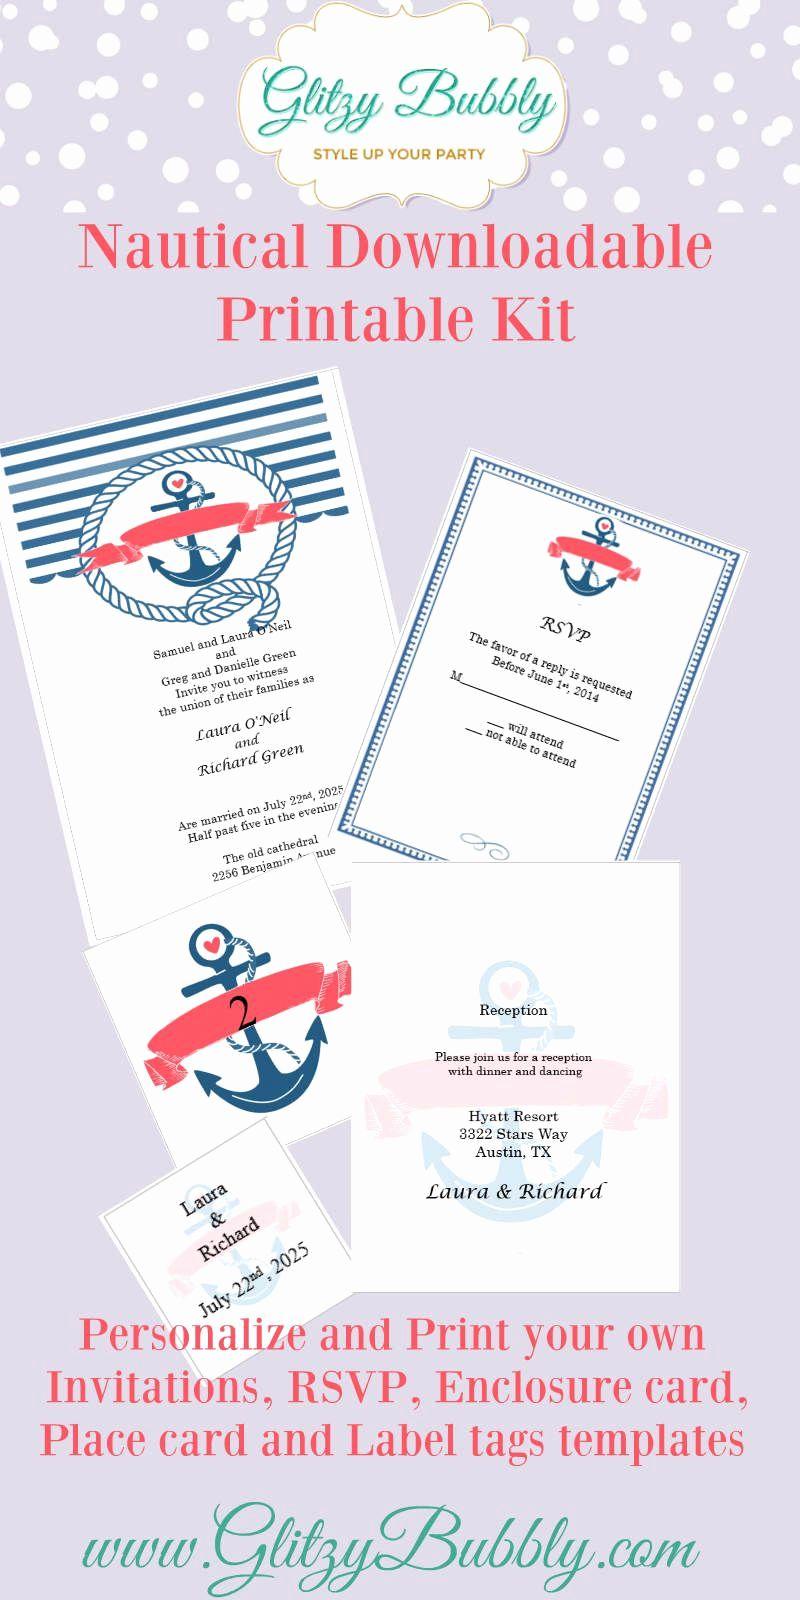 Free Nautical Invitation Templates Inspirational Download Your Free Nautic Nautical Wedding Invitations Nautical Invitations Nautical Theme Wedding Invitations